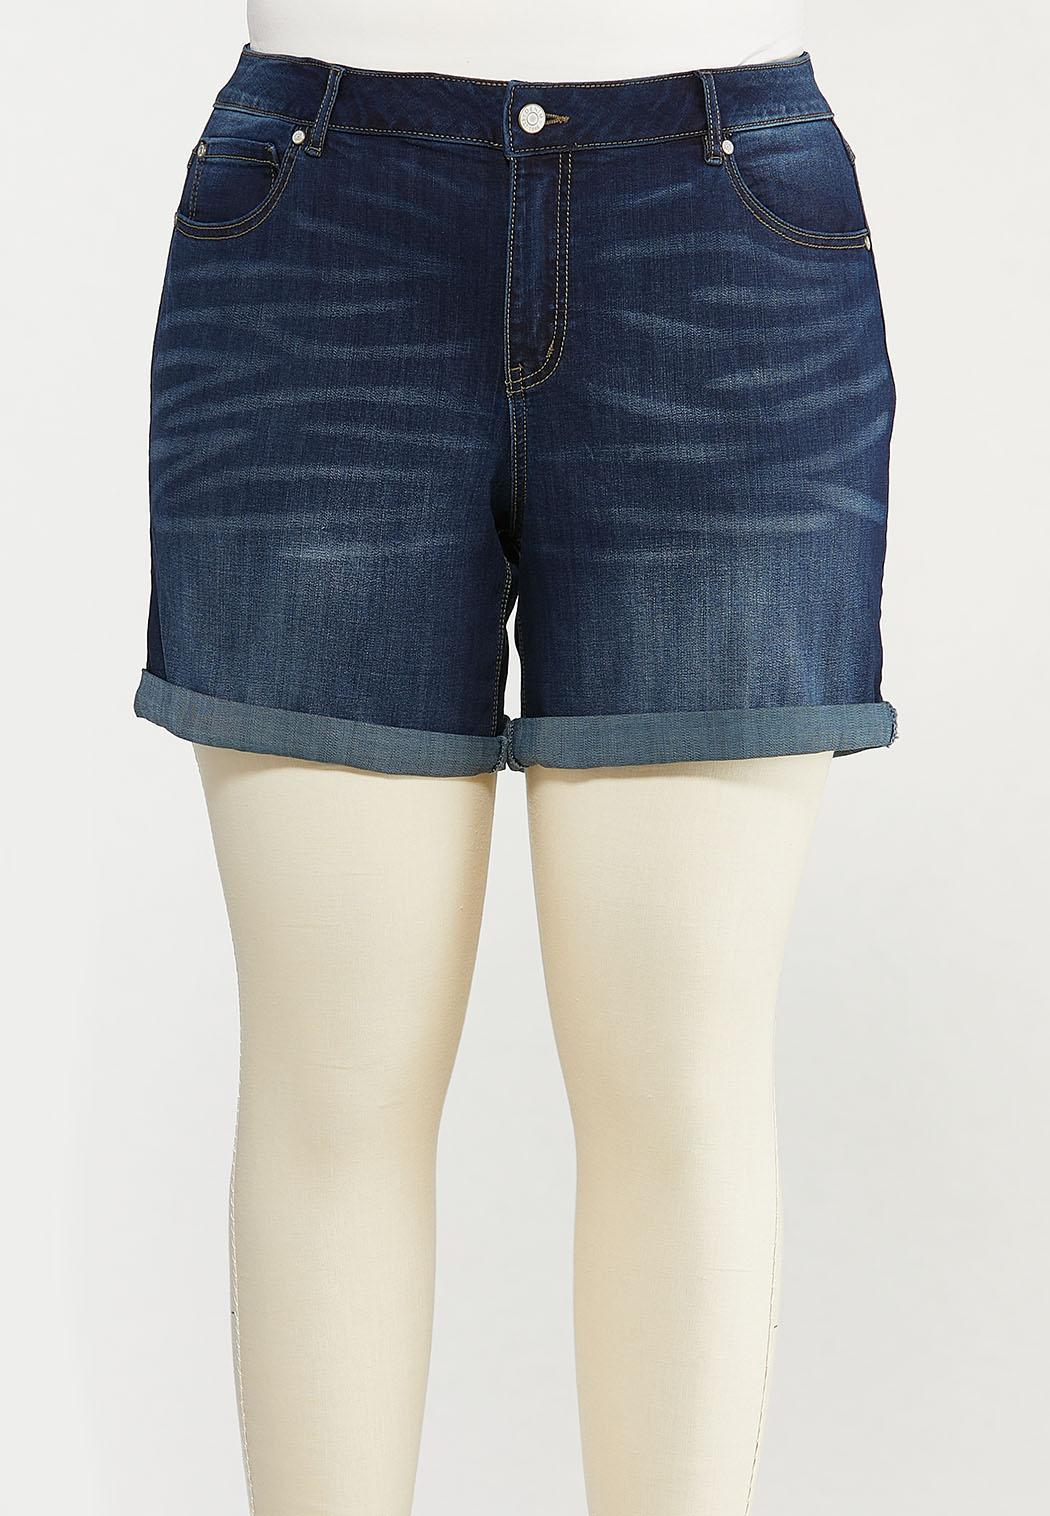 Plus Size Dark Denim Shorts